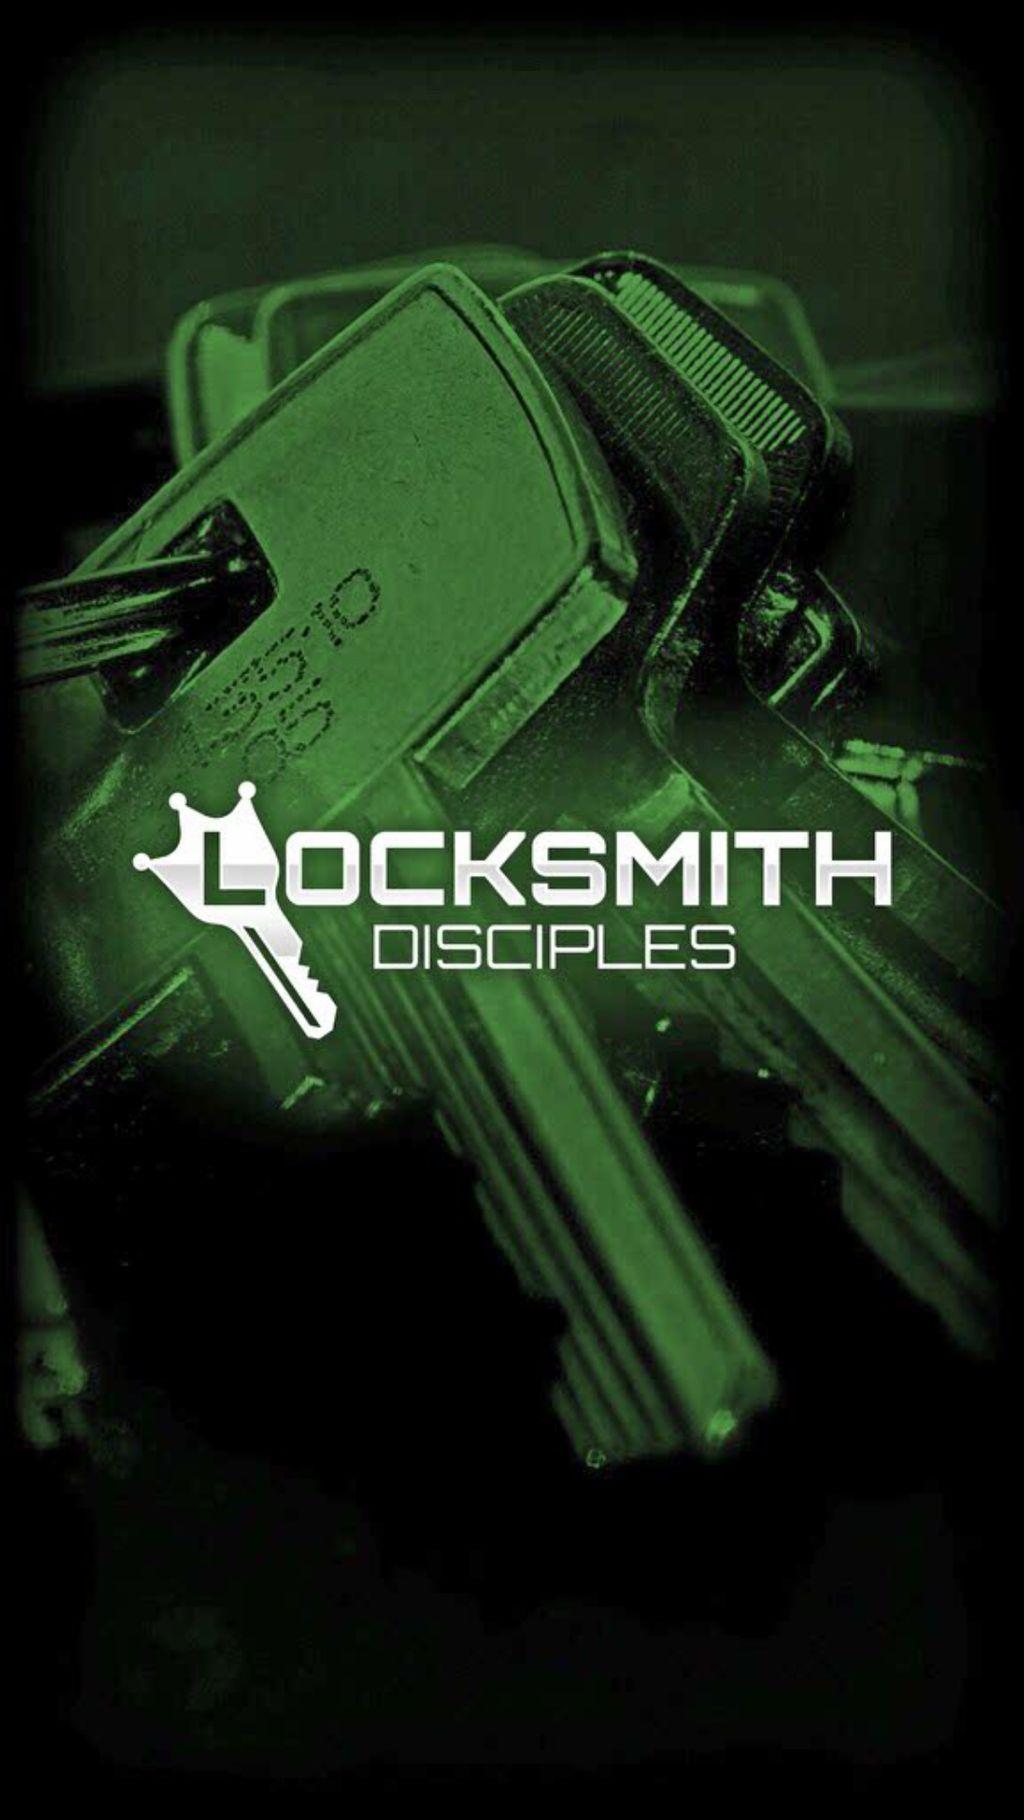 Locksmith Disciples